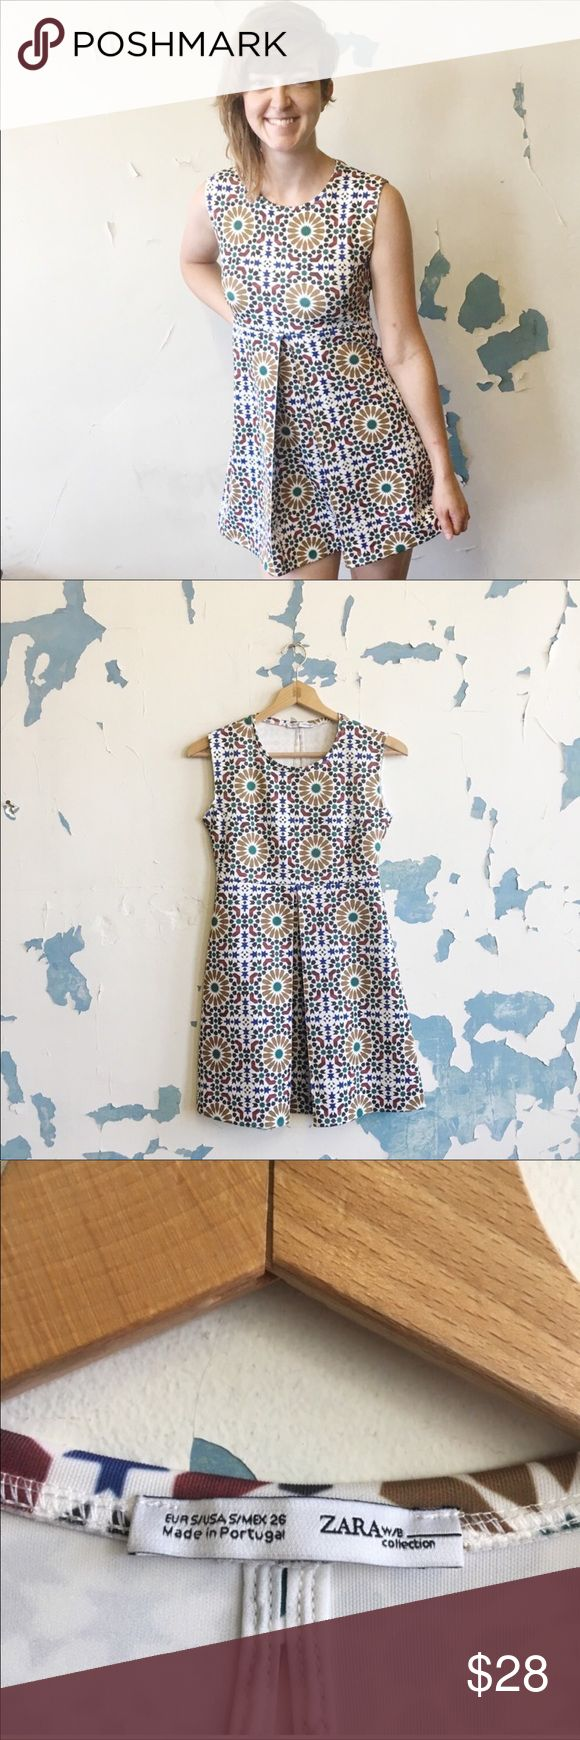 Zara | Geometric Aztec Print Neoprene Skater Dress This modern geometric print d…